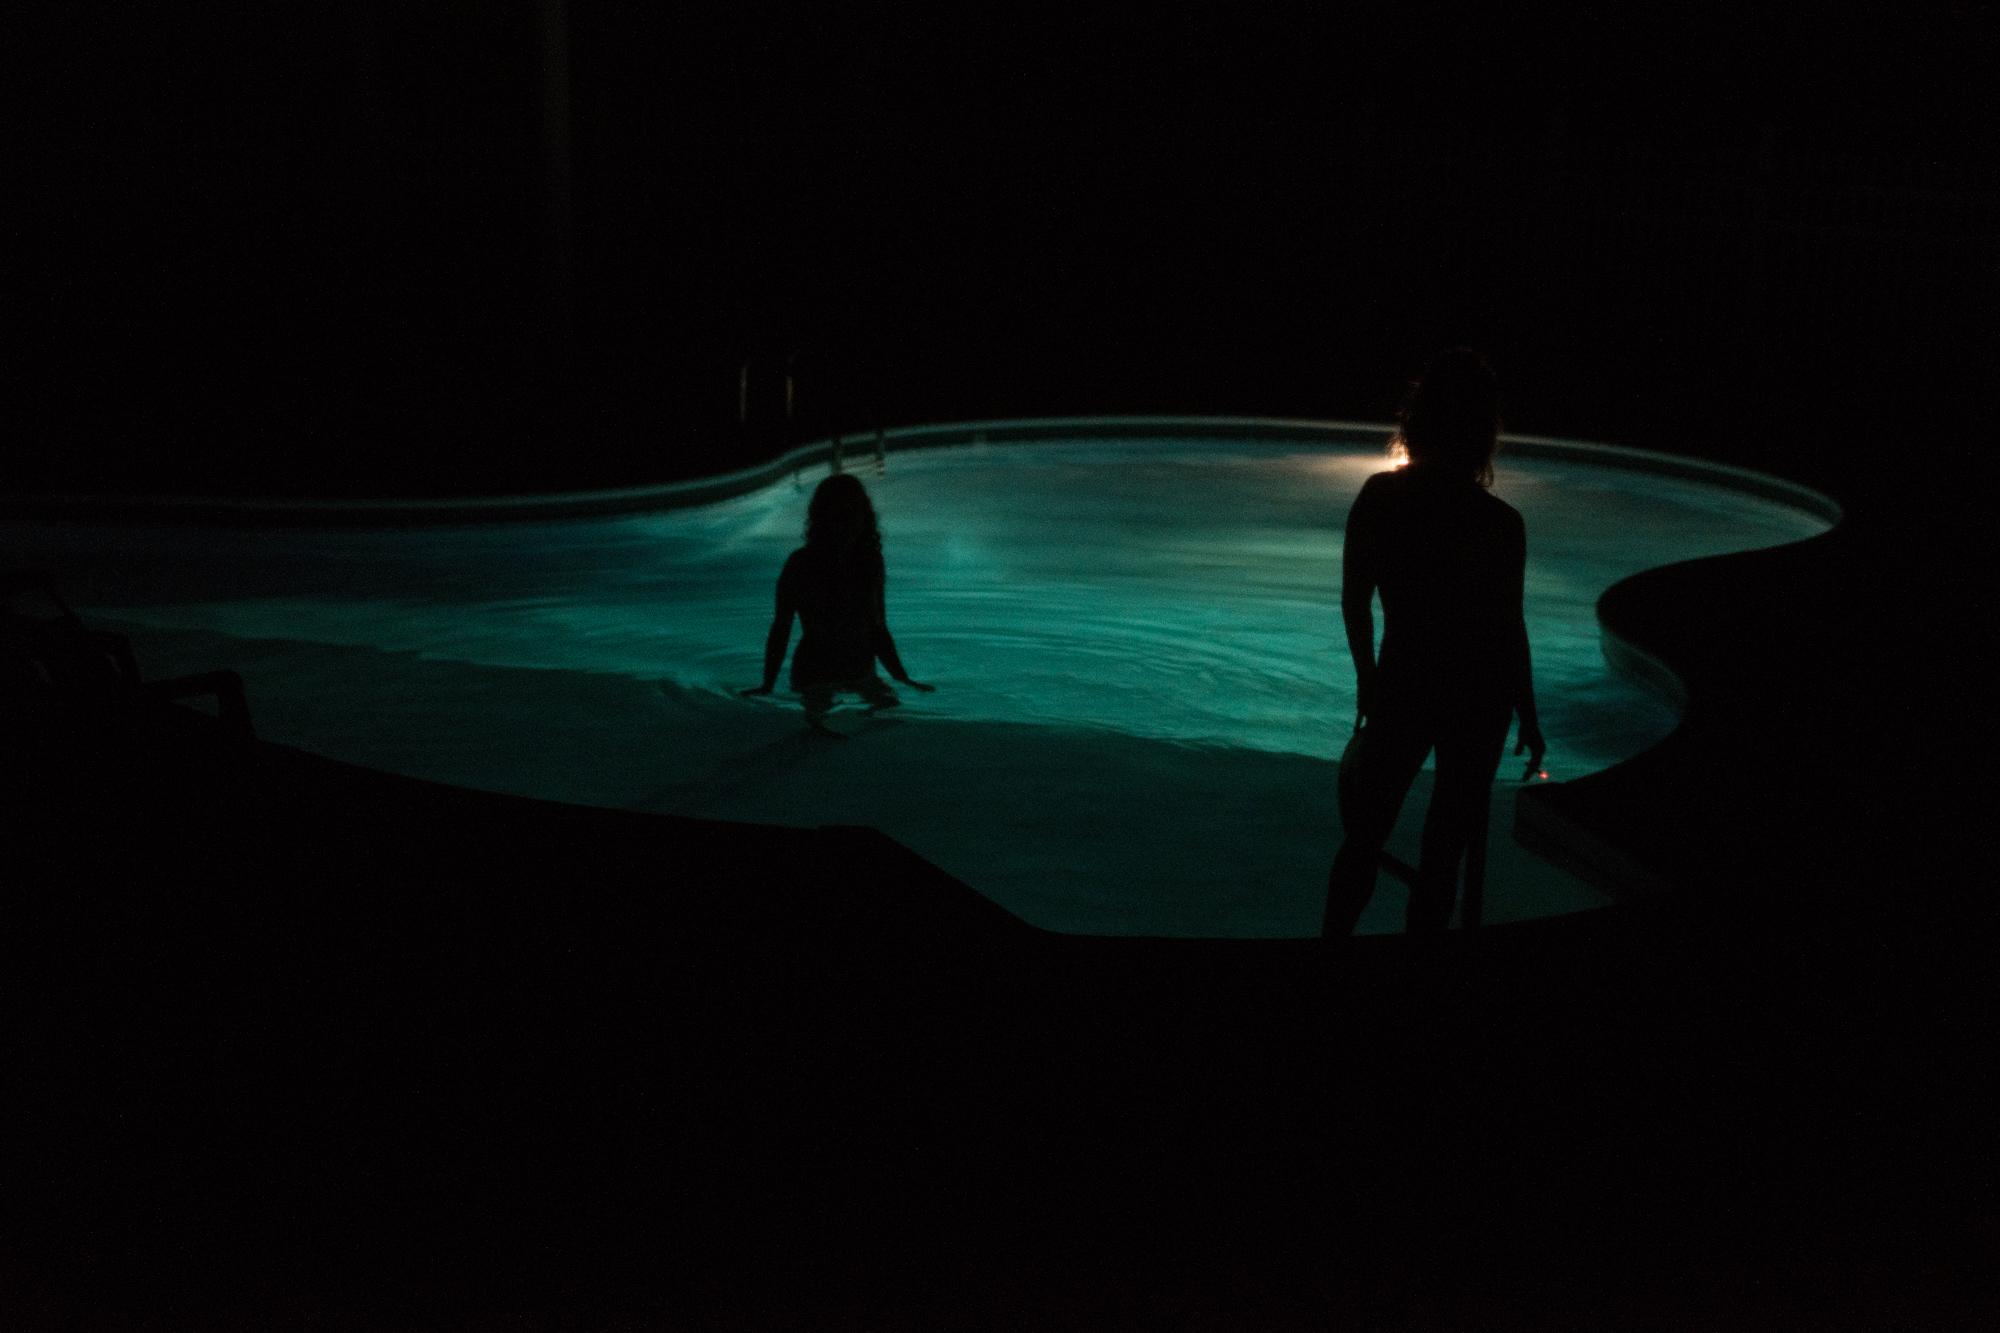 20170619-Ariane-Cassidy-Hannah-swimming-pool-X-Pro2-0003-Edit.jpg